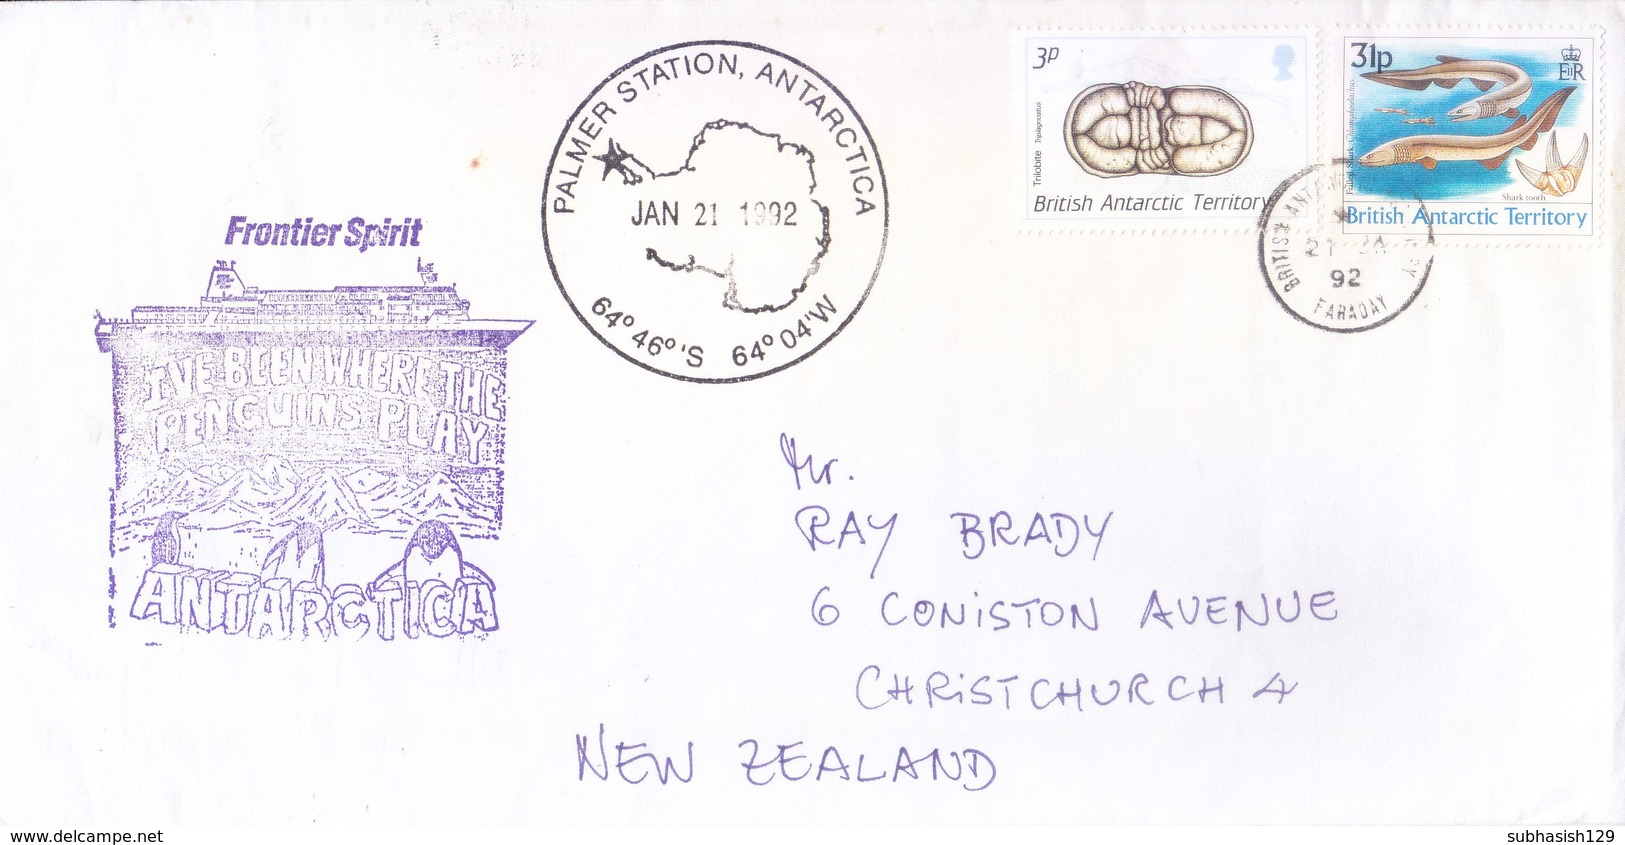 BRITISH ANTARCTIC TERRITORY - EXPEDITION COVER, 1992 - FRONTIER SPIRIT, SLOGAN CANCELLATION, PALMER STATION - British Antarctic Territory  (BAT)